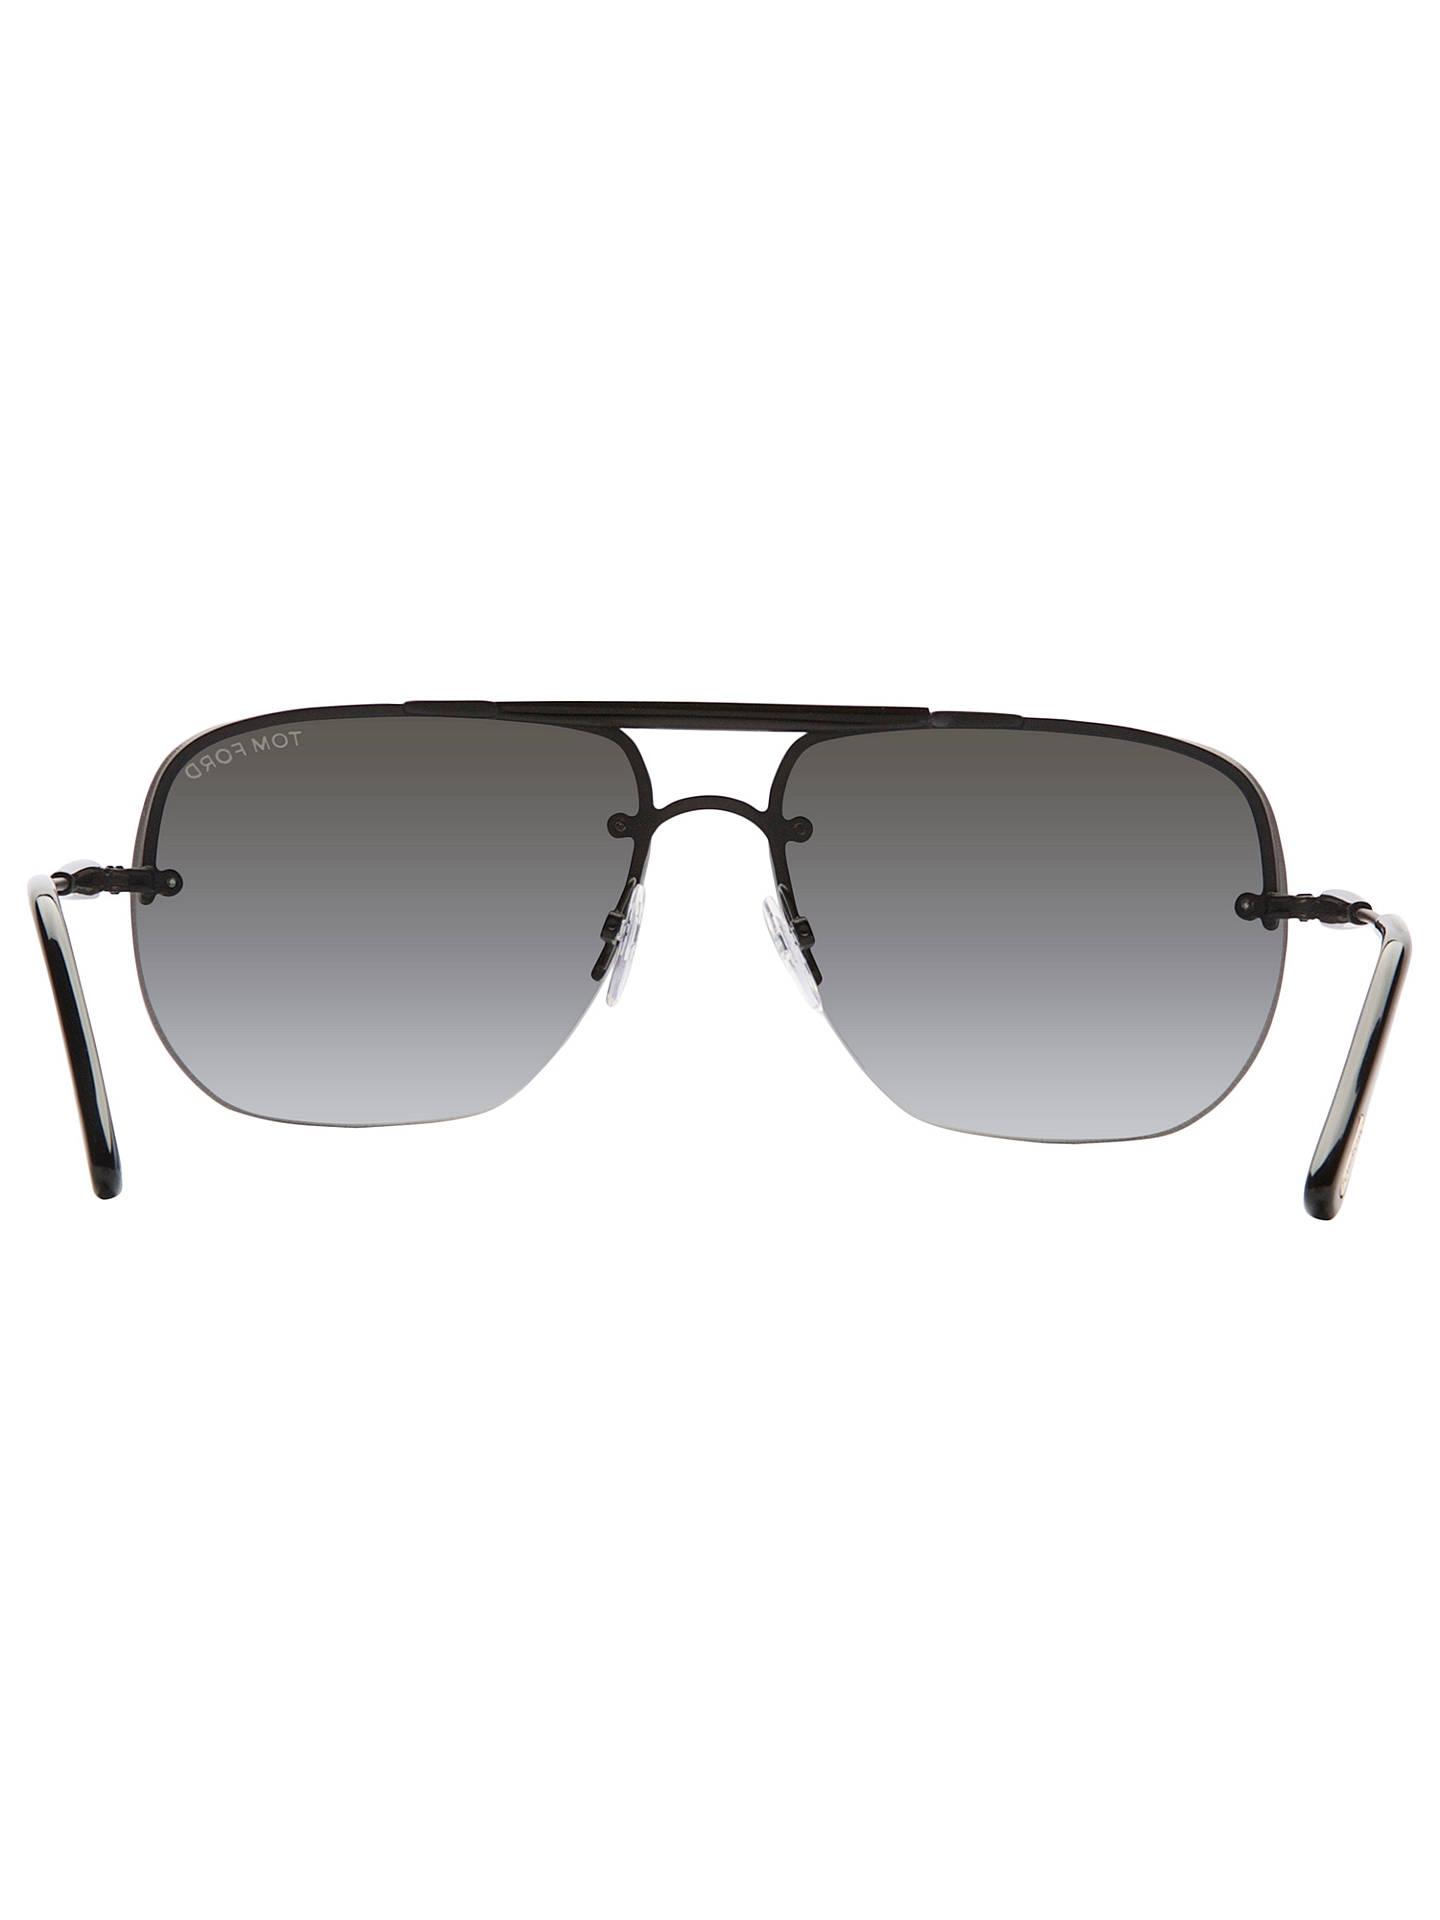 acefdf3a36768 TOM FORD FT0380 Nils Aviator Sunglasses at John Lewis   Partners